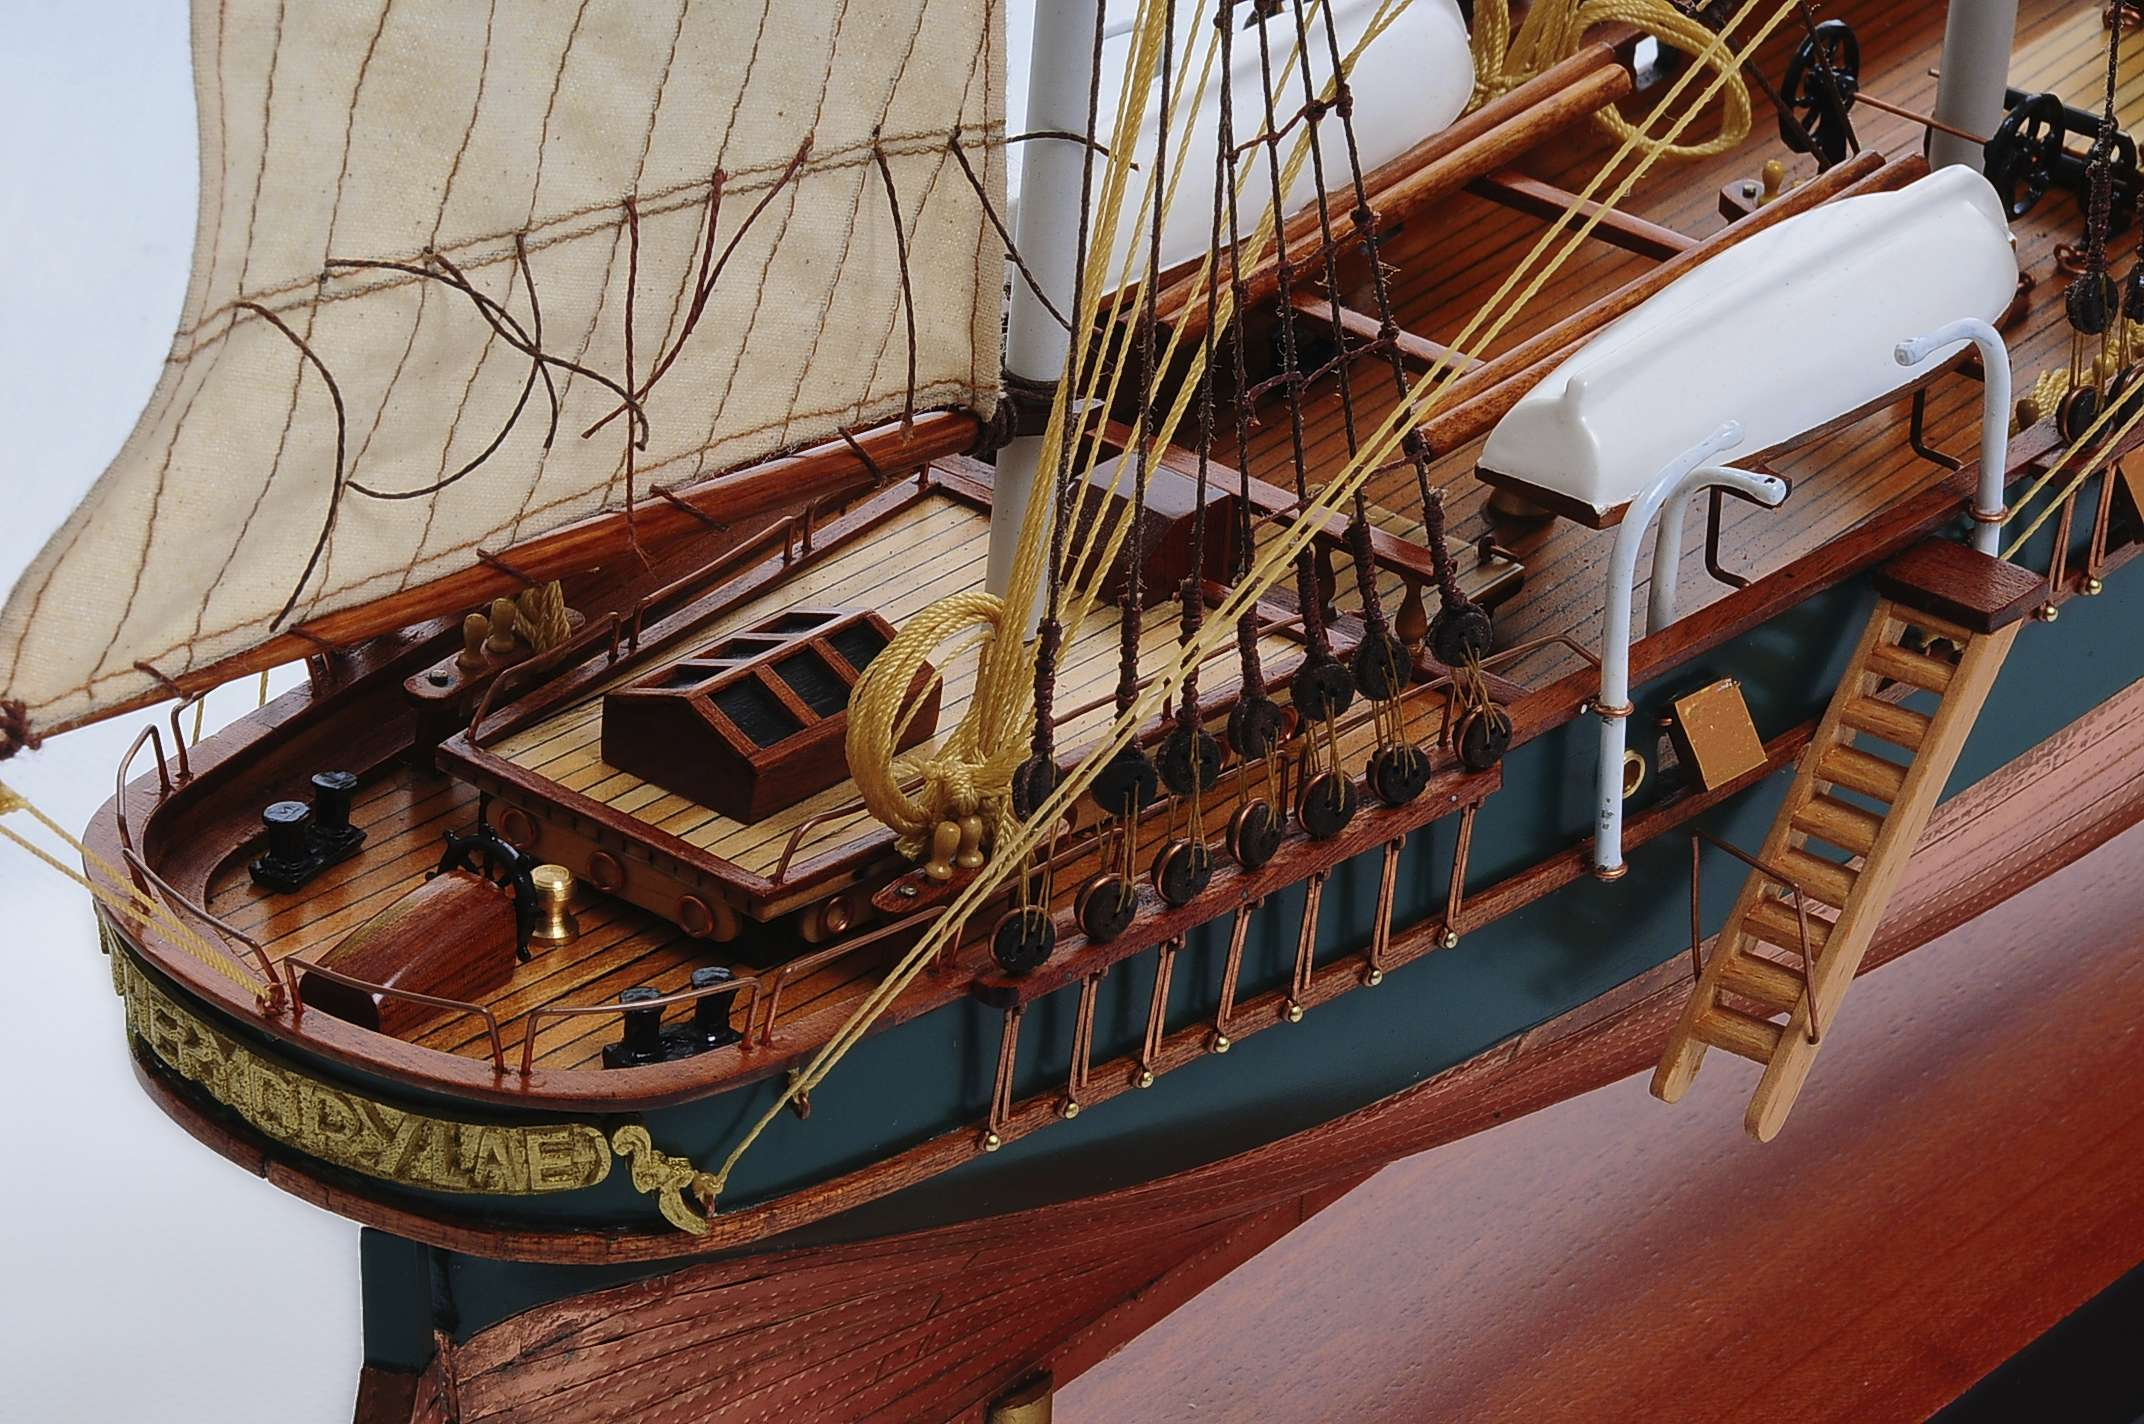 1434-4863-Thermopylae-Model-Boat